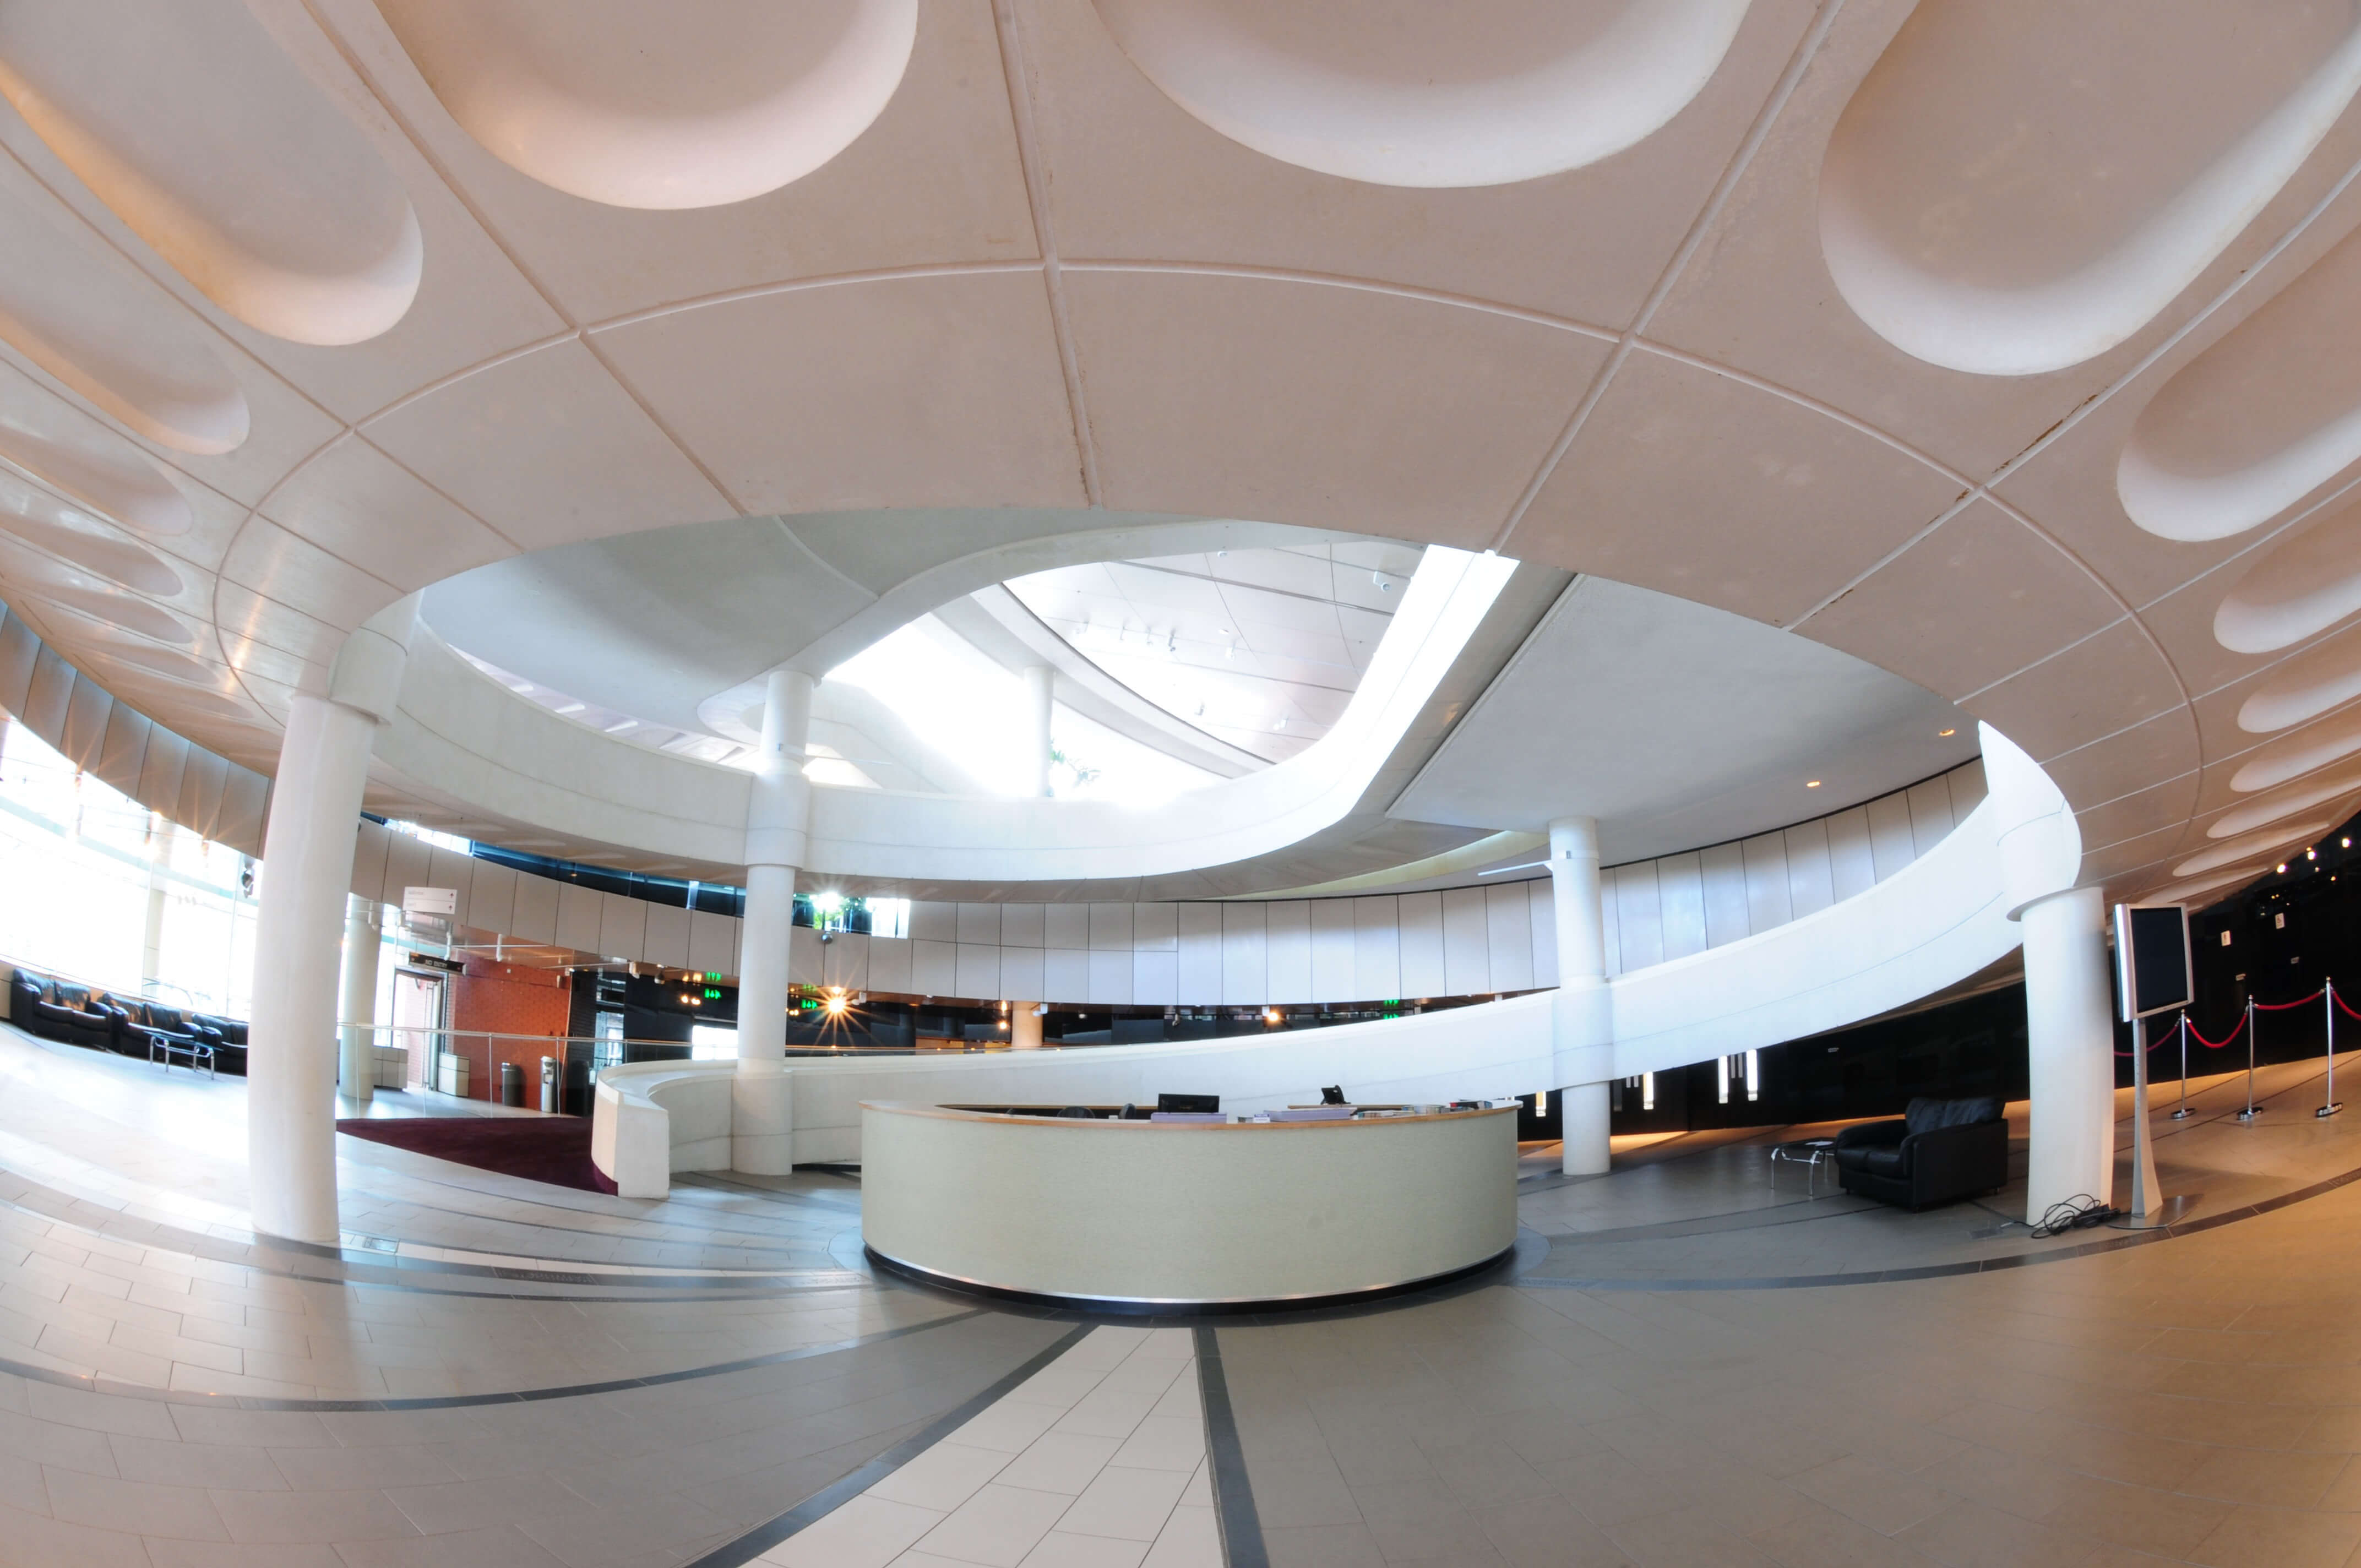 Entrance of Harrogate Convention Centre